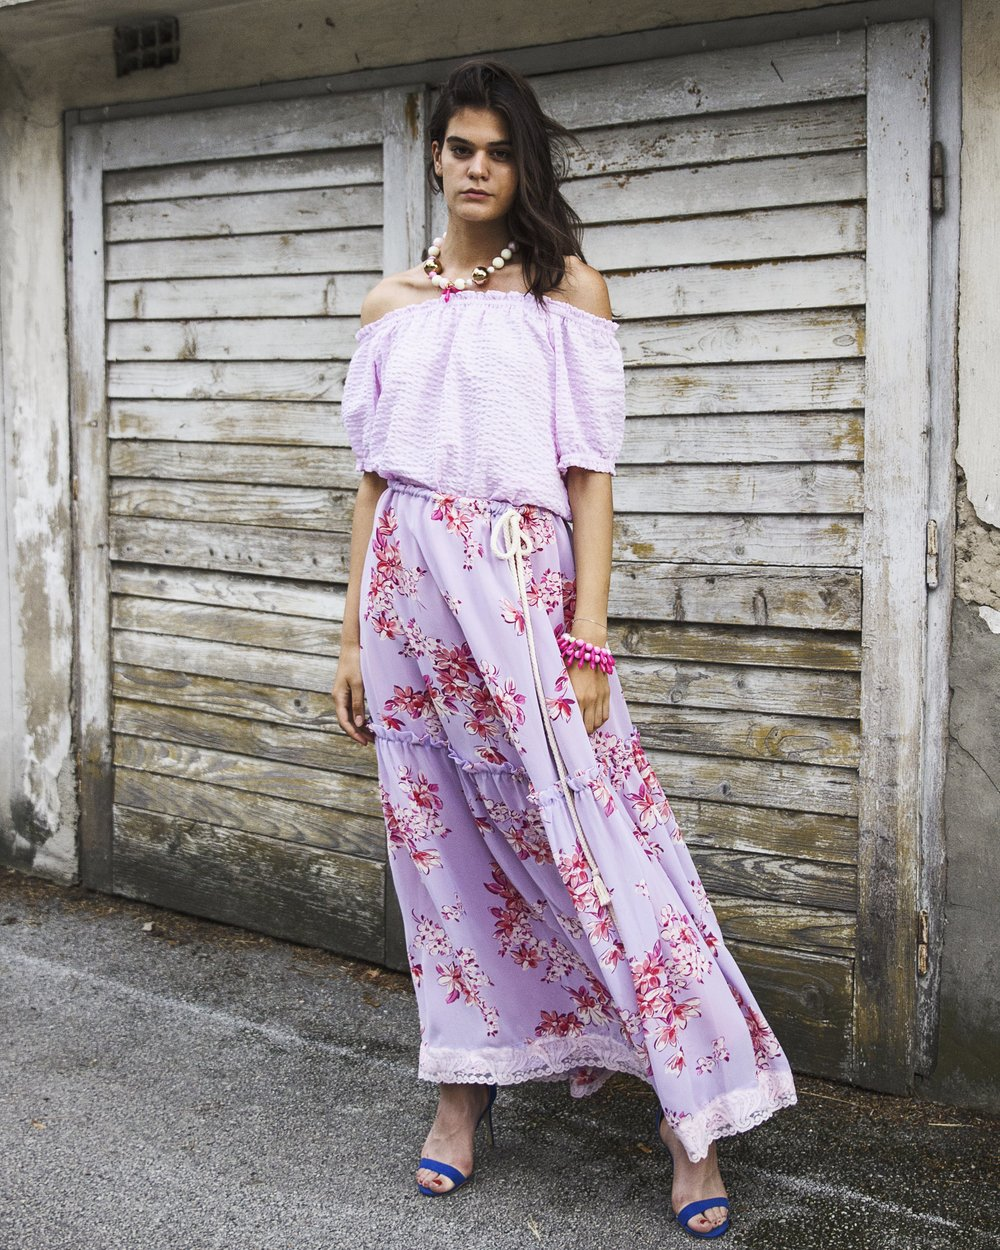 luka-lajic-fashion-photography-robert-sever-dizajner (5).jpg